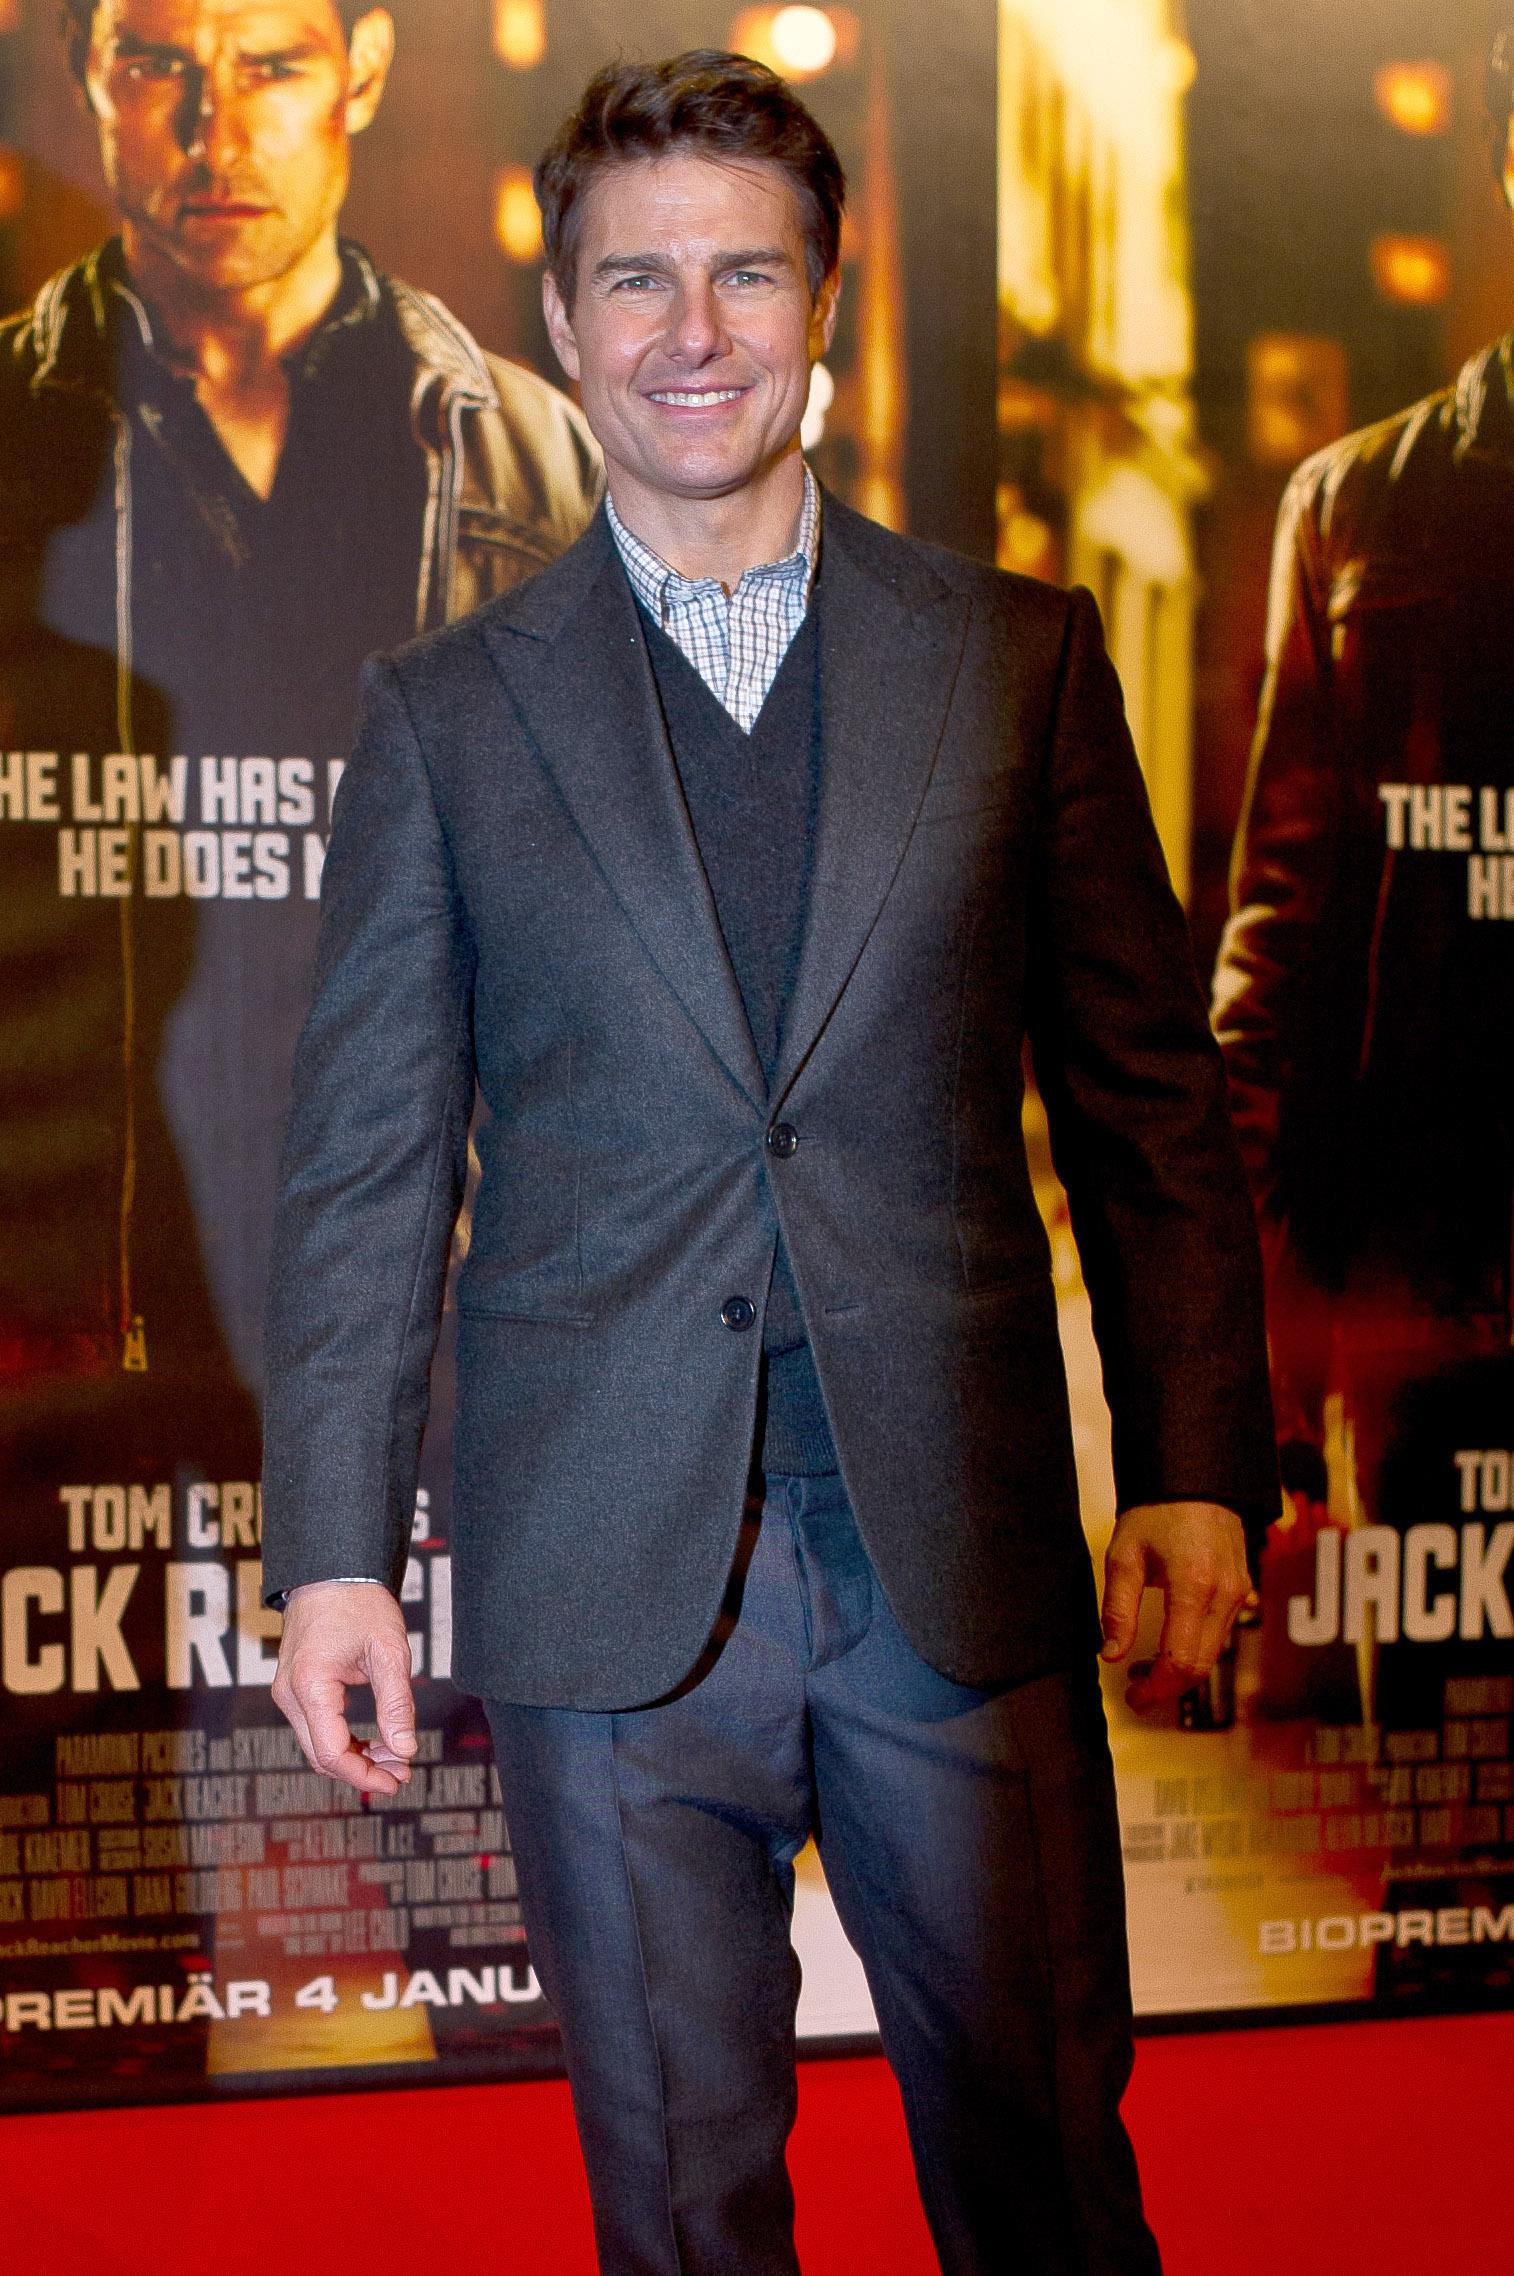 STOCKHOLM, SWEDEN - DECEMBER 11: Tom Cruise attends the Swedish Premiere of 'Jack Reacher' at Multiplex Sergel on December 11, 2012 in Stockholm, Sweden. (Photo by Ivan da Silva/Getty Images)